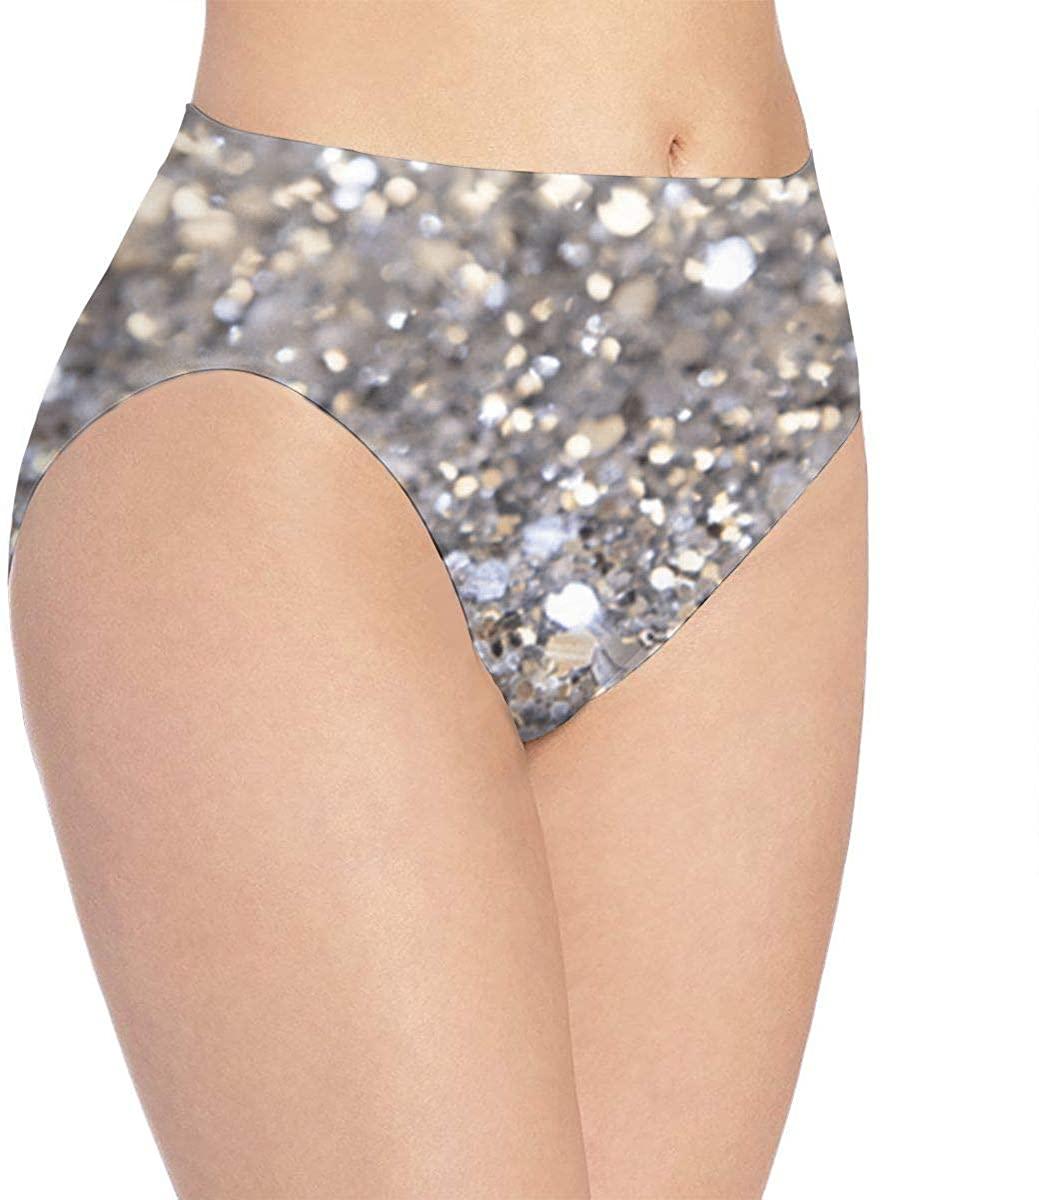 DMoMoMD Women Underwear Silver Glitter Briefs Soft Sexy Bikini Panty